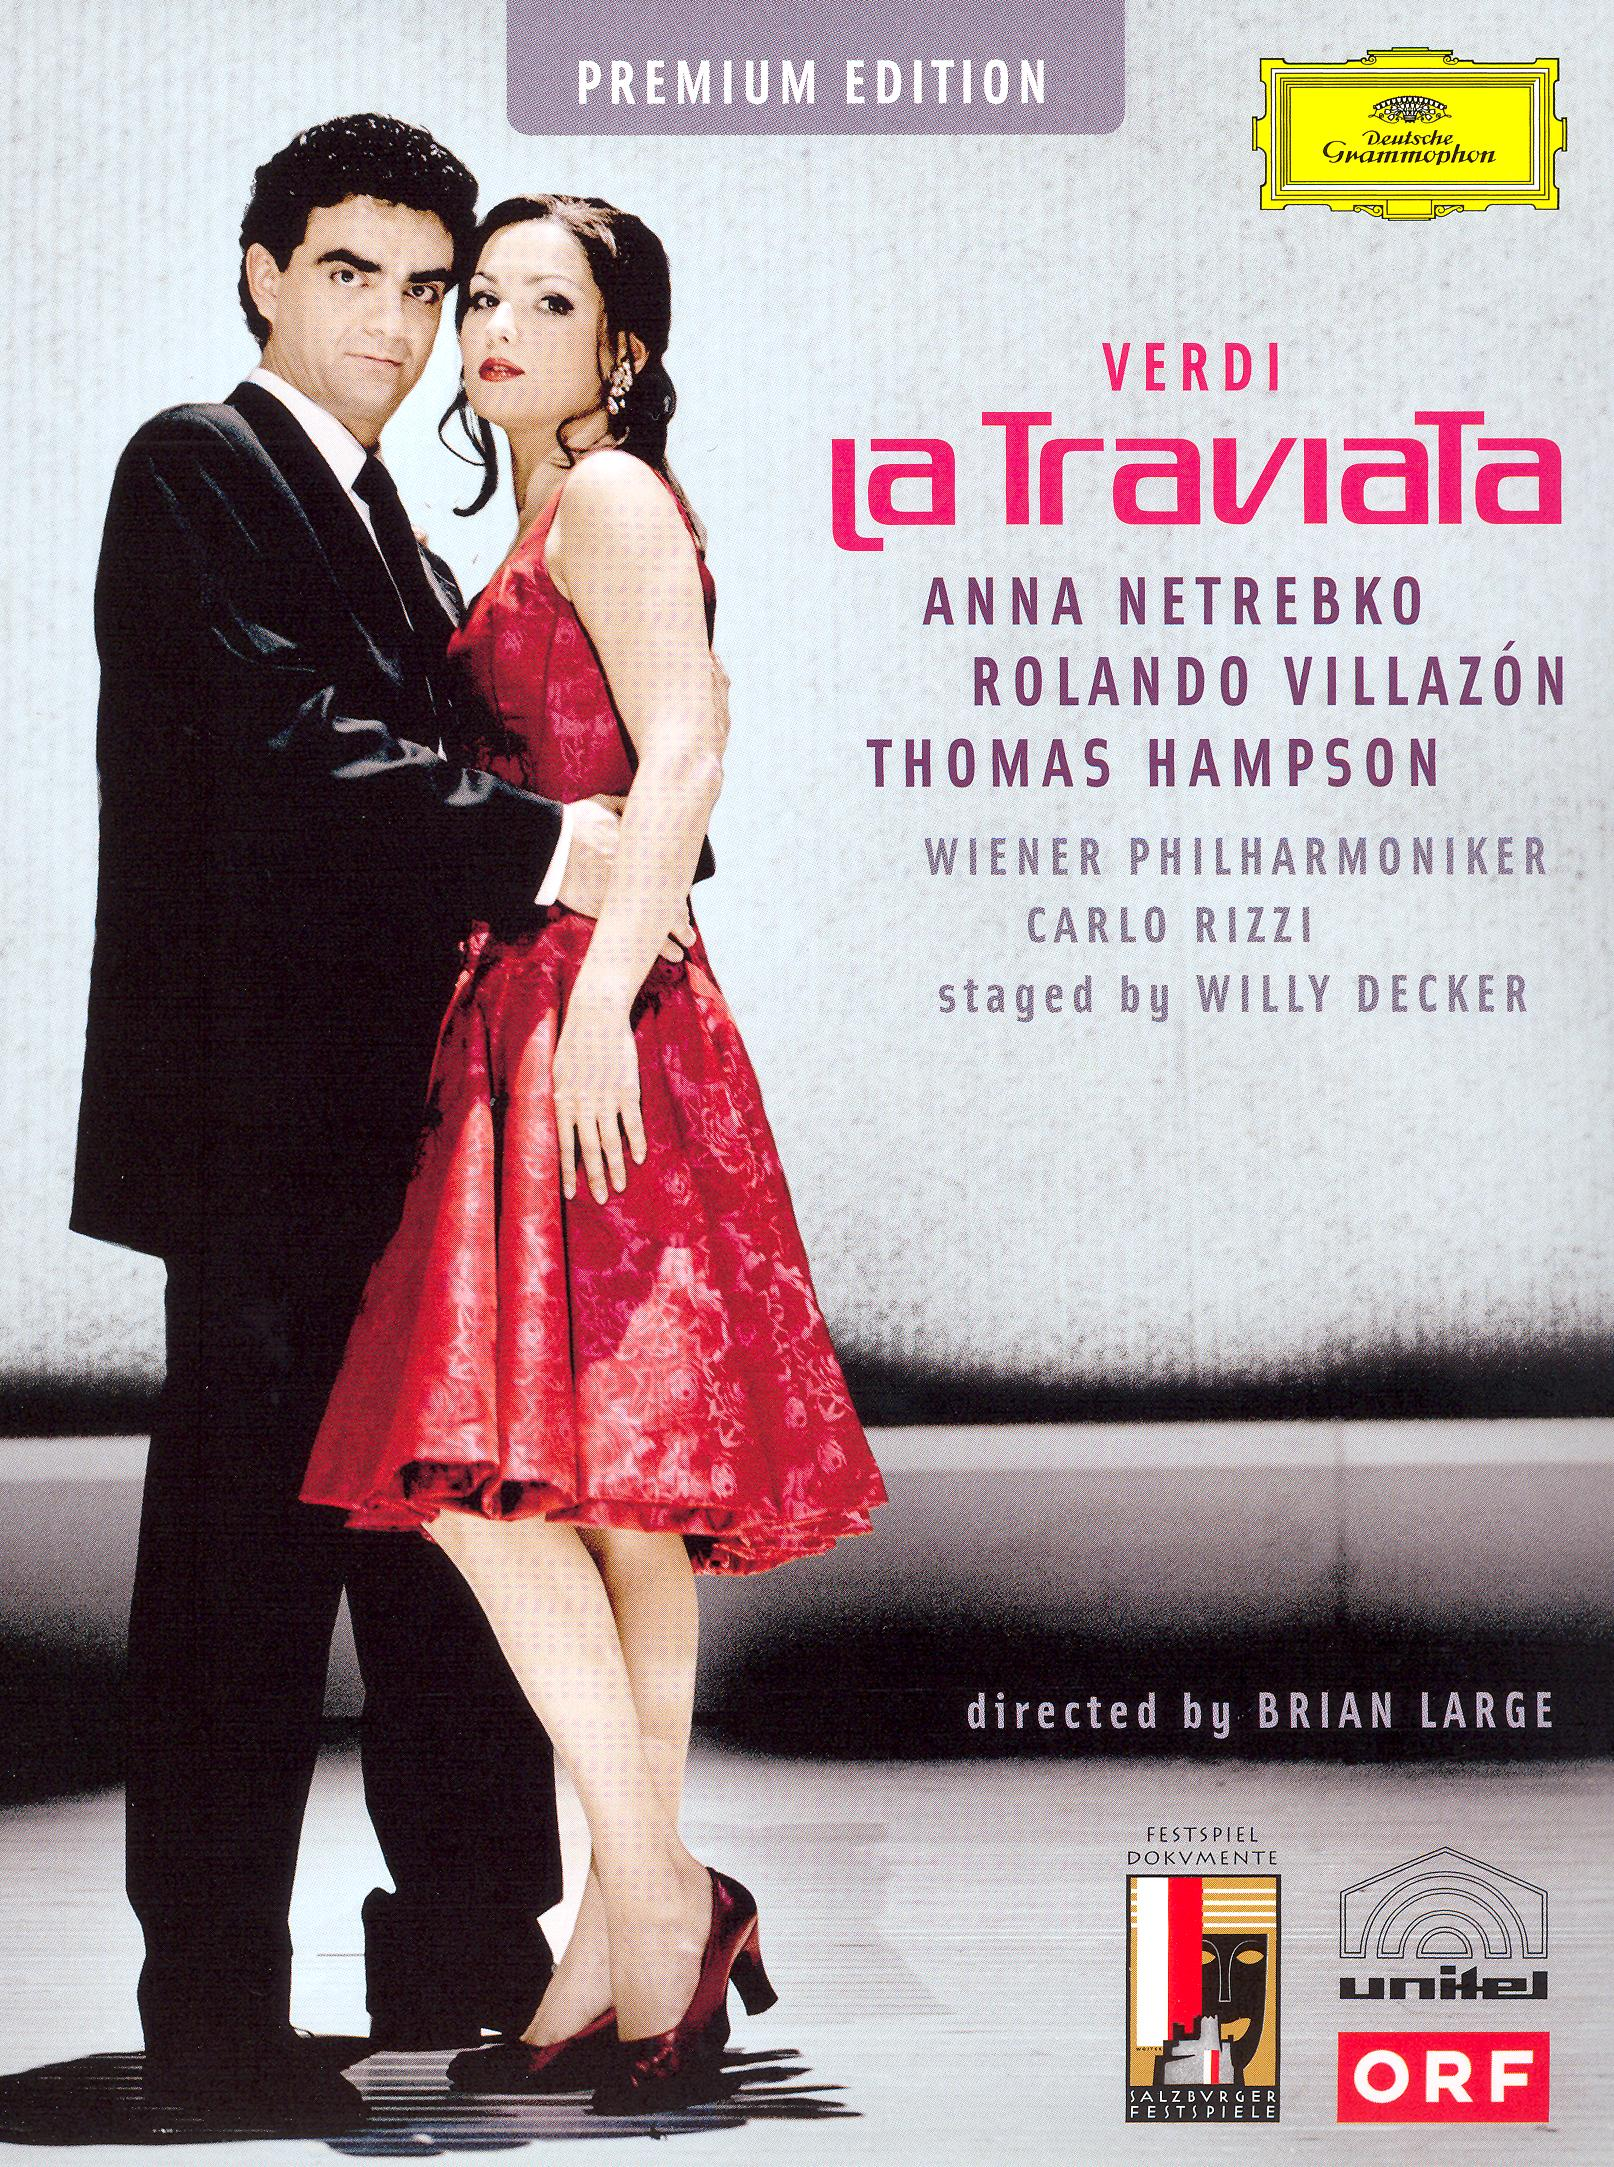 La Traviata (Wiener Philharmoniker)